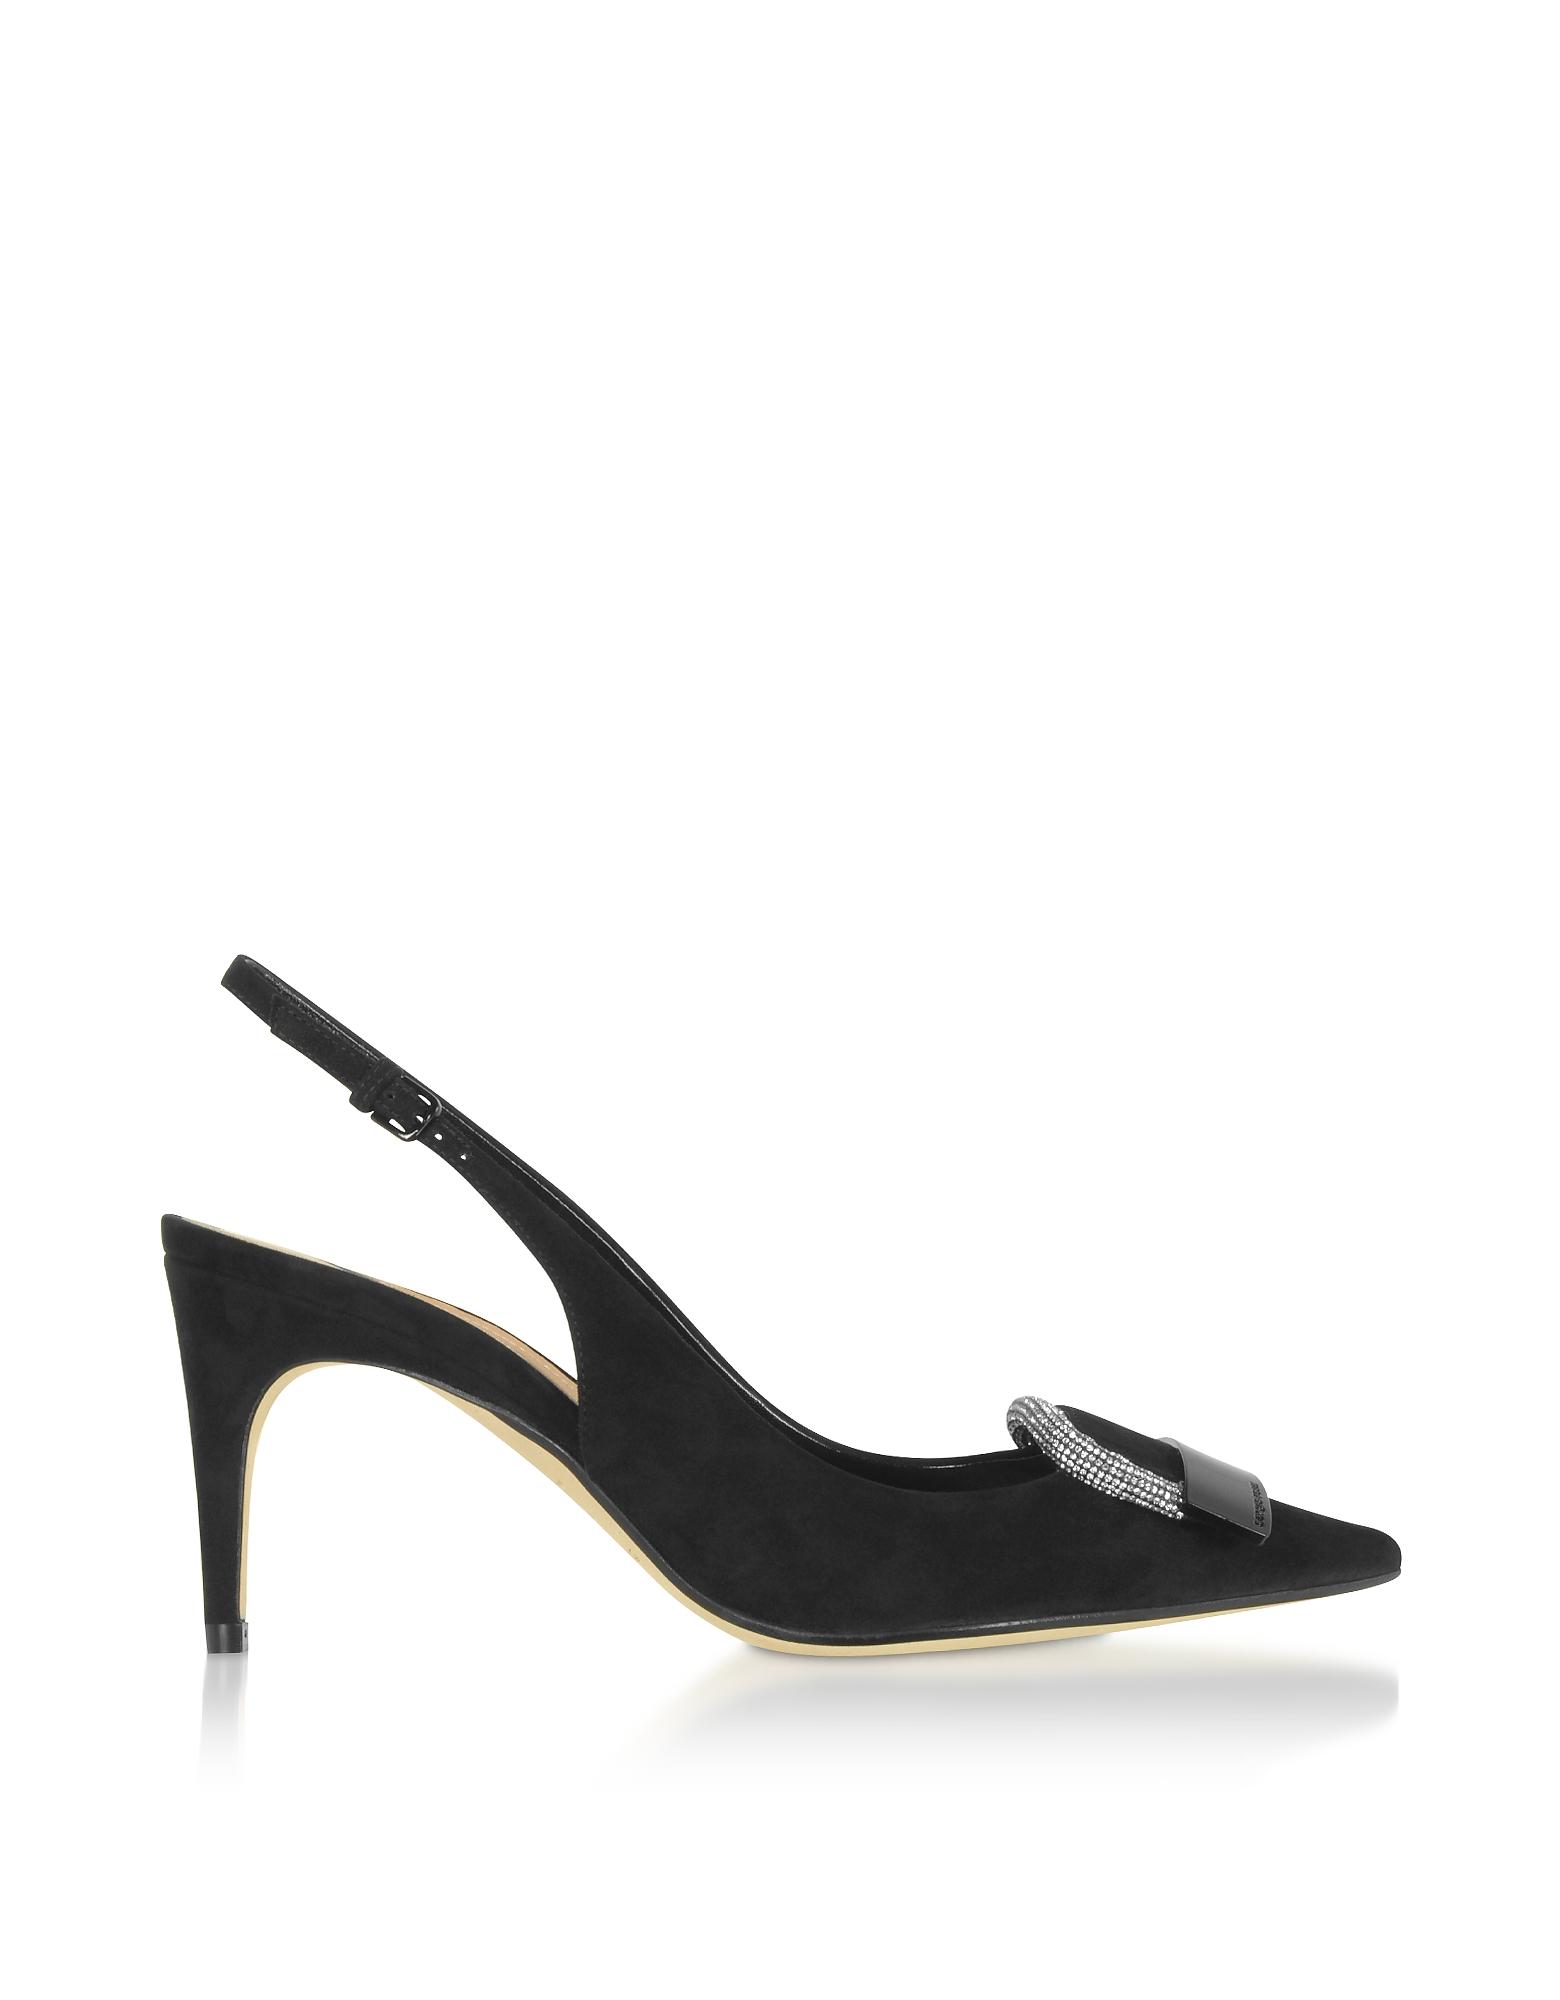 Sergio Rossi Designer Shoes, sr1 Black Royal Slingbacks w/ Crystals